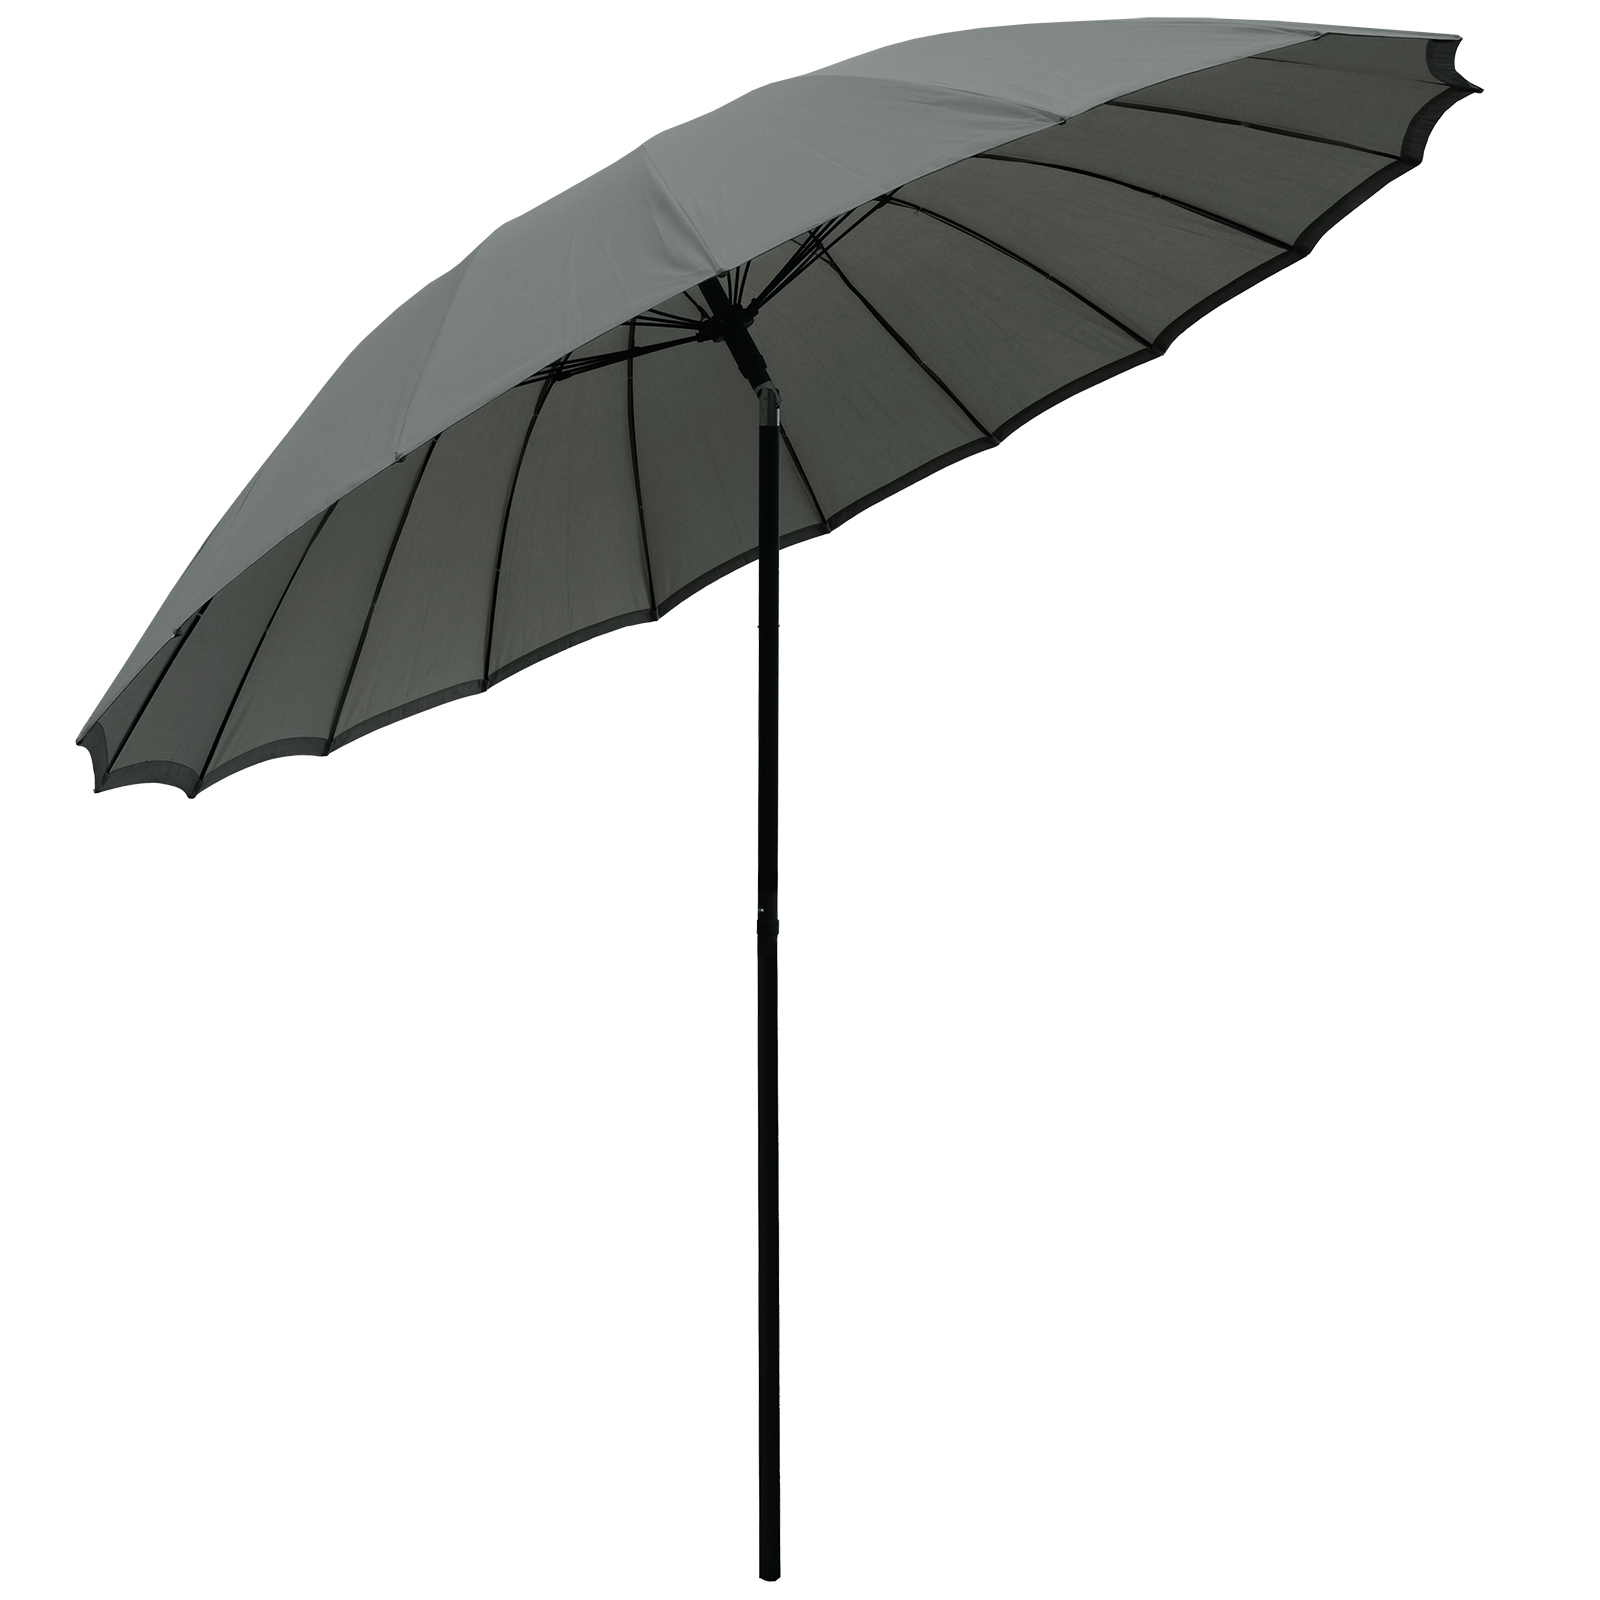 New tilting shanghai parasol umbrella sun shade for for Patio furniture with umbrella